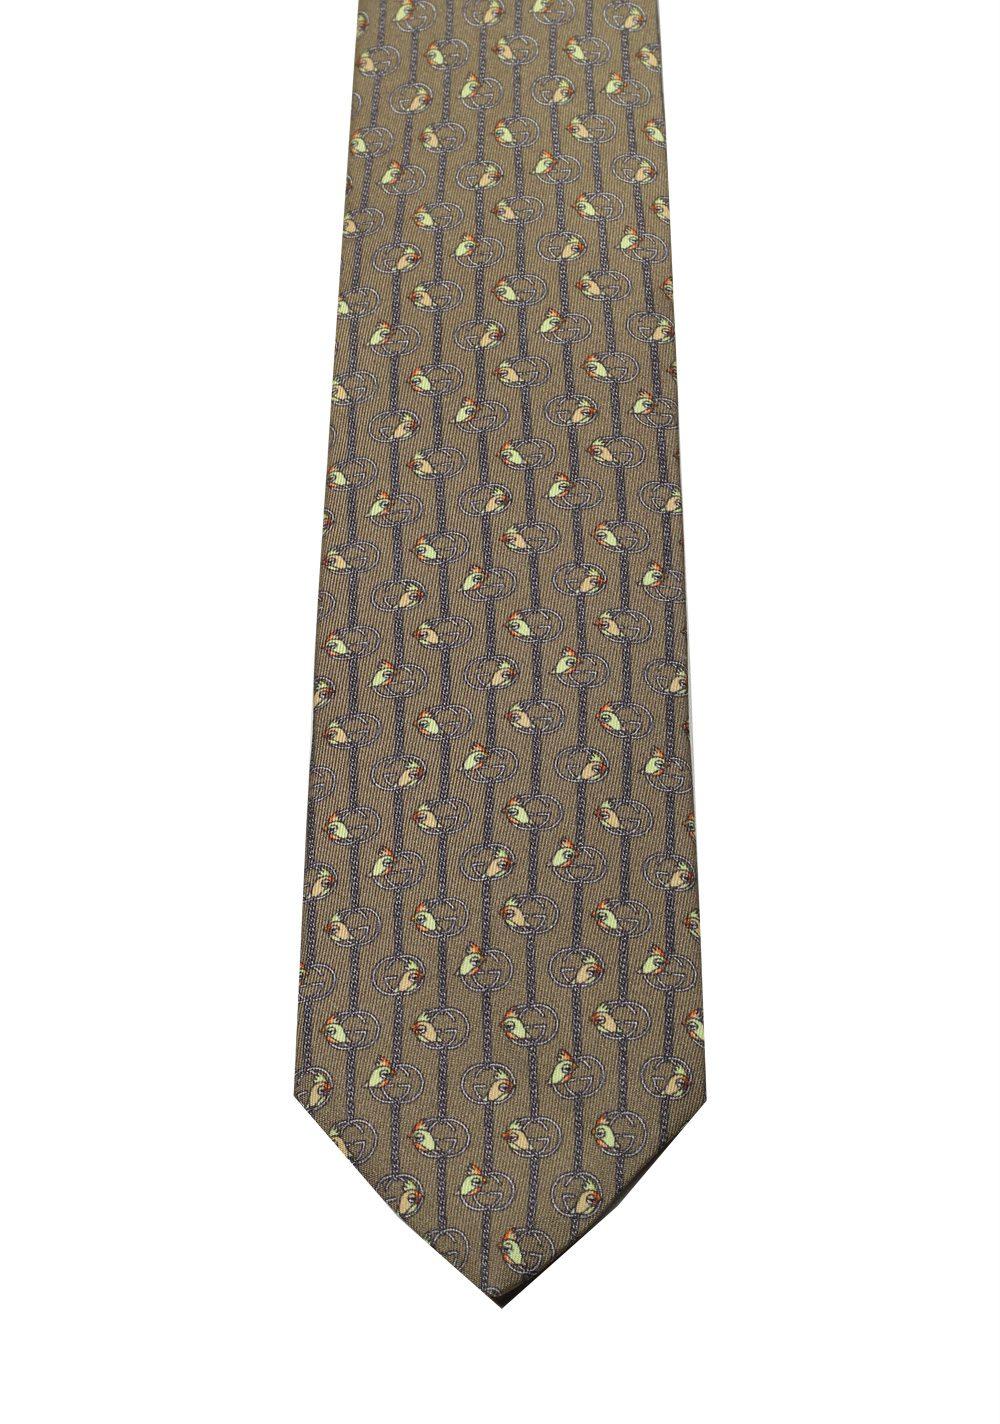 Gucci Brown Patterned Bird Tie | Costume Limité